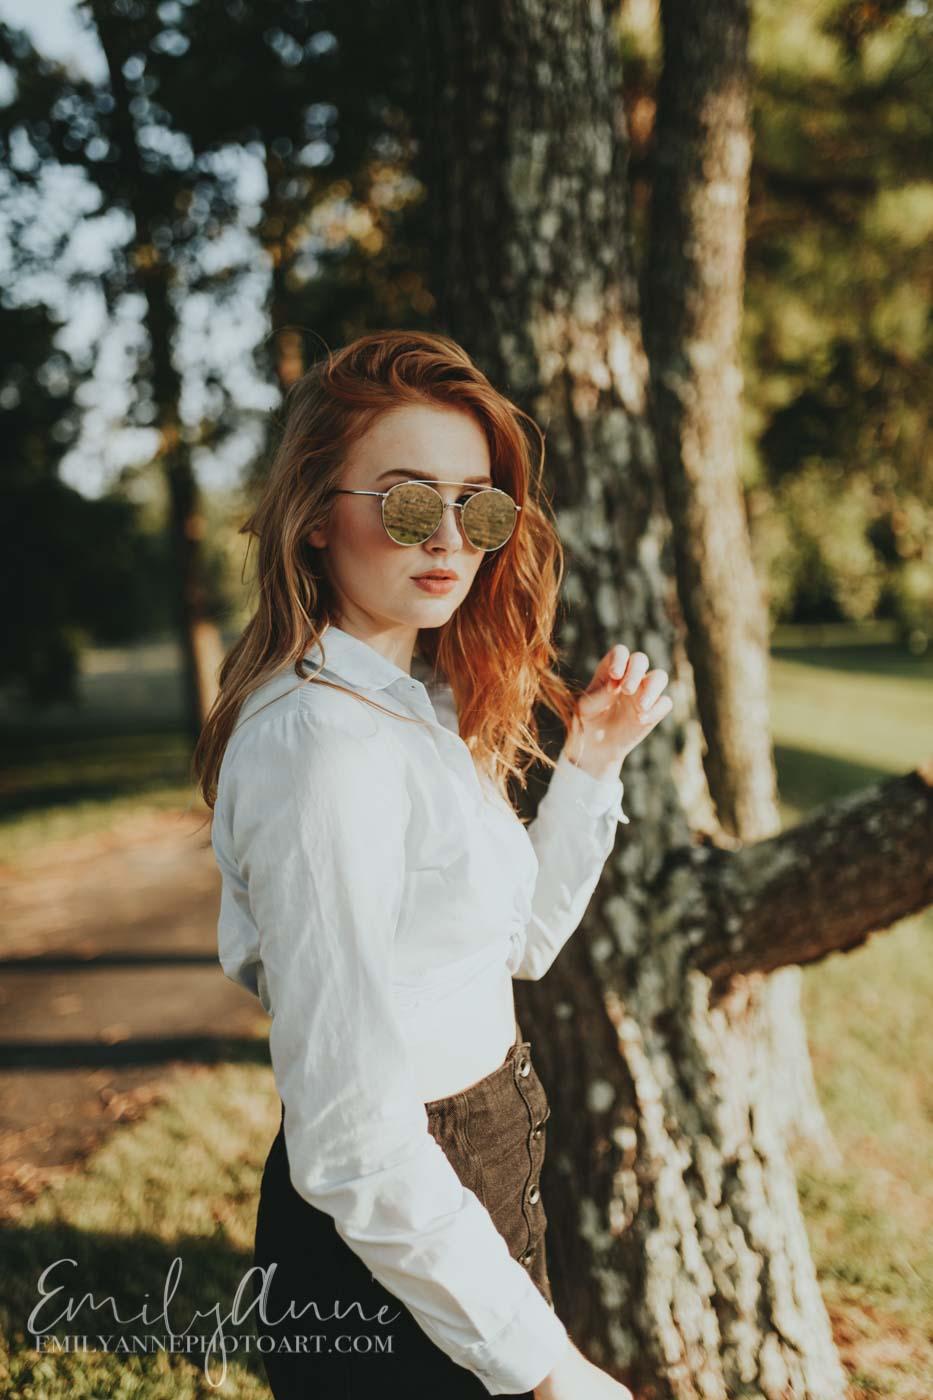 modeling/senior portrait photography Emily Anne